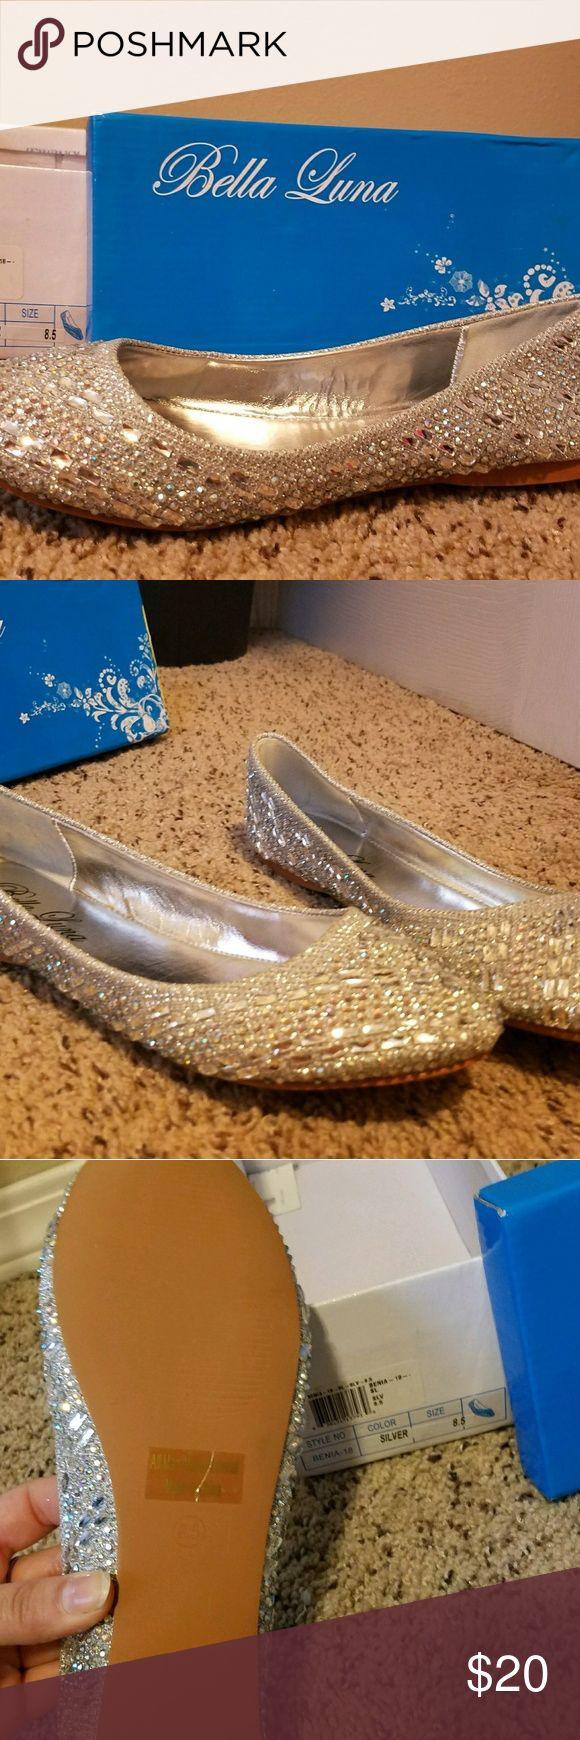 Bella Luna Flats Necer worn Bella Luna silver jeweled flats Bella Luna  Shoes Flats & Loafers